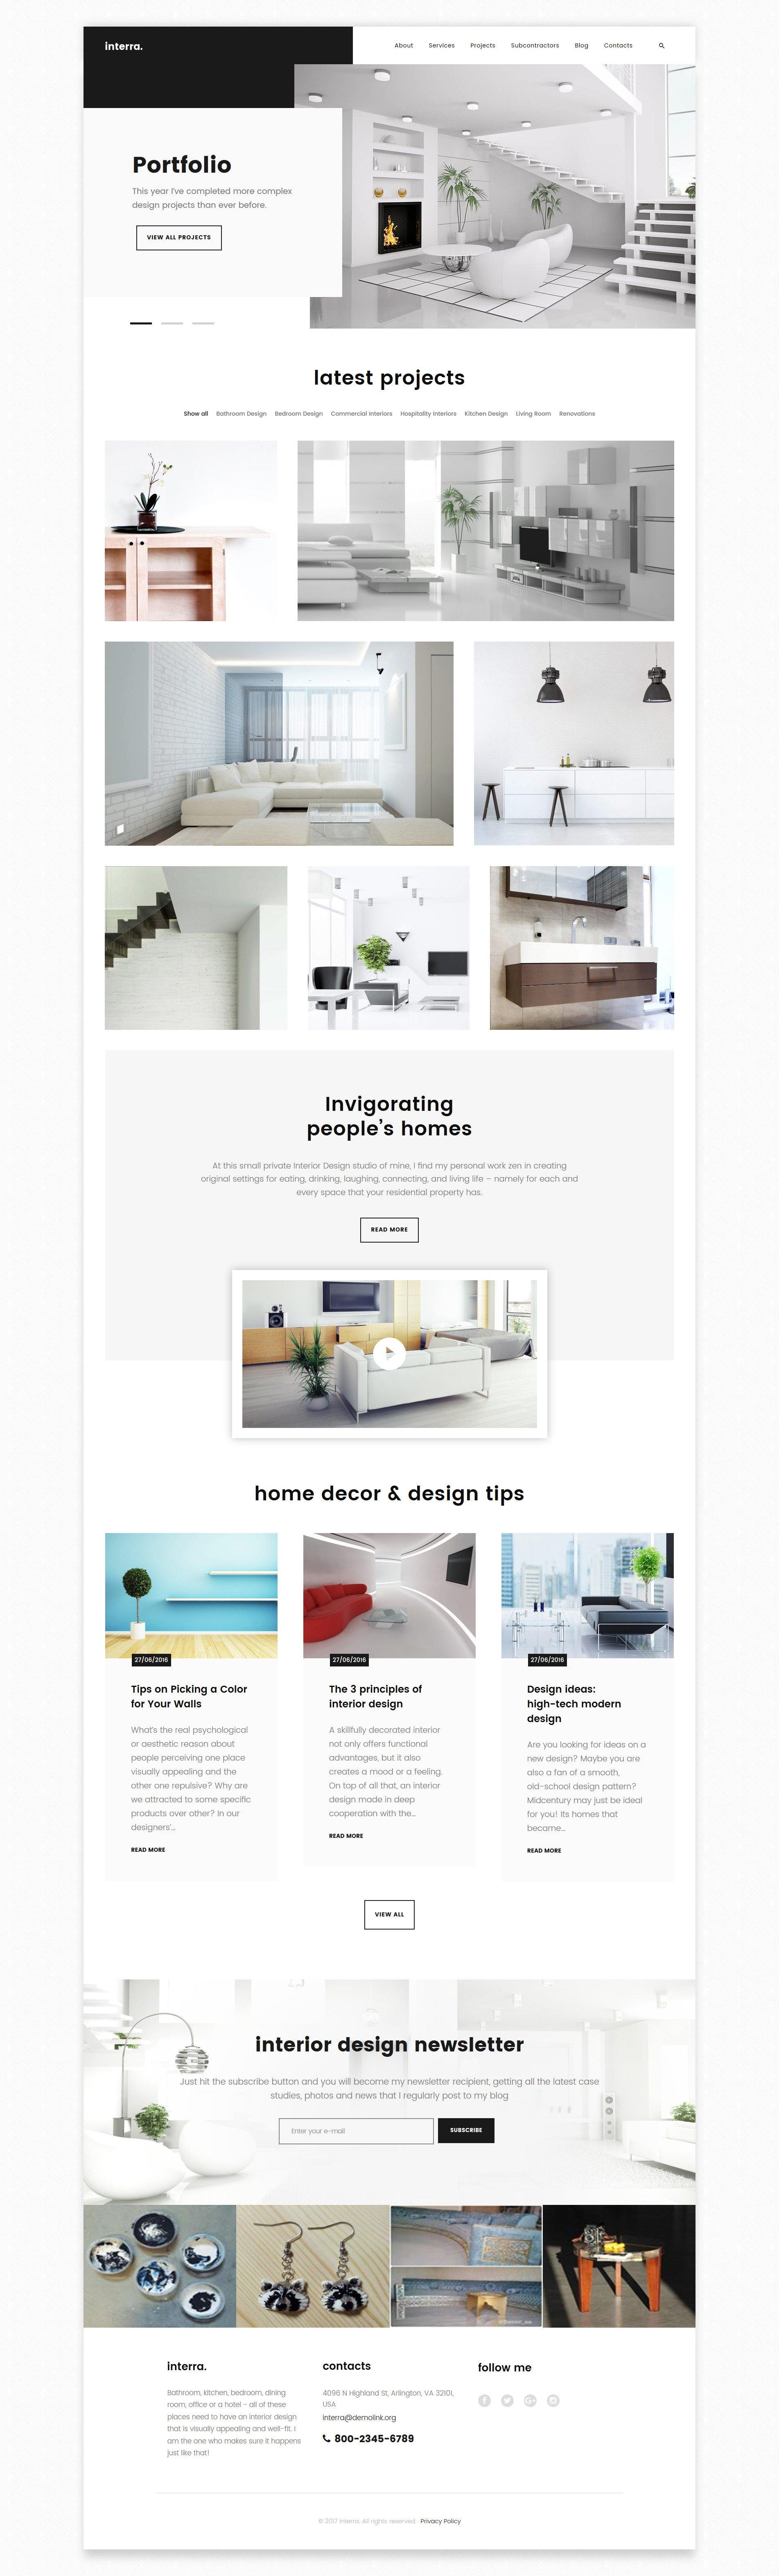 interra the best interior design wordpress theme rh templatemonster com interior design portfolio templates download interior design portfolio template free